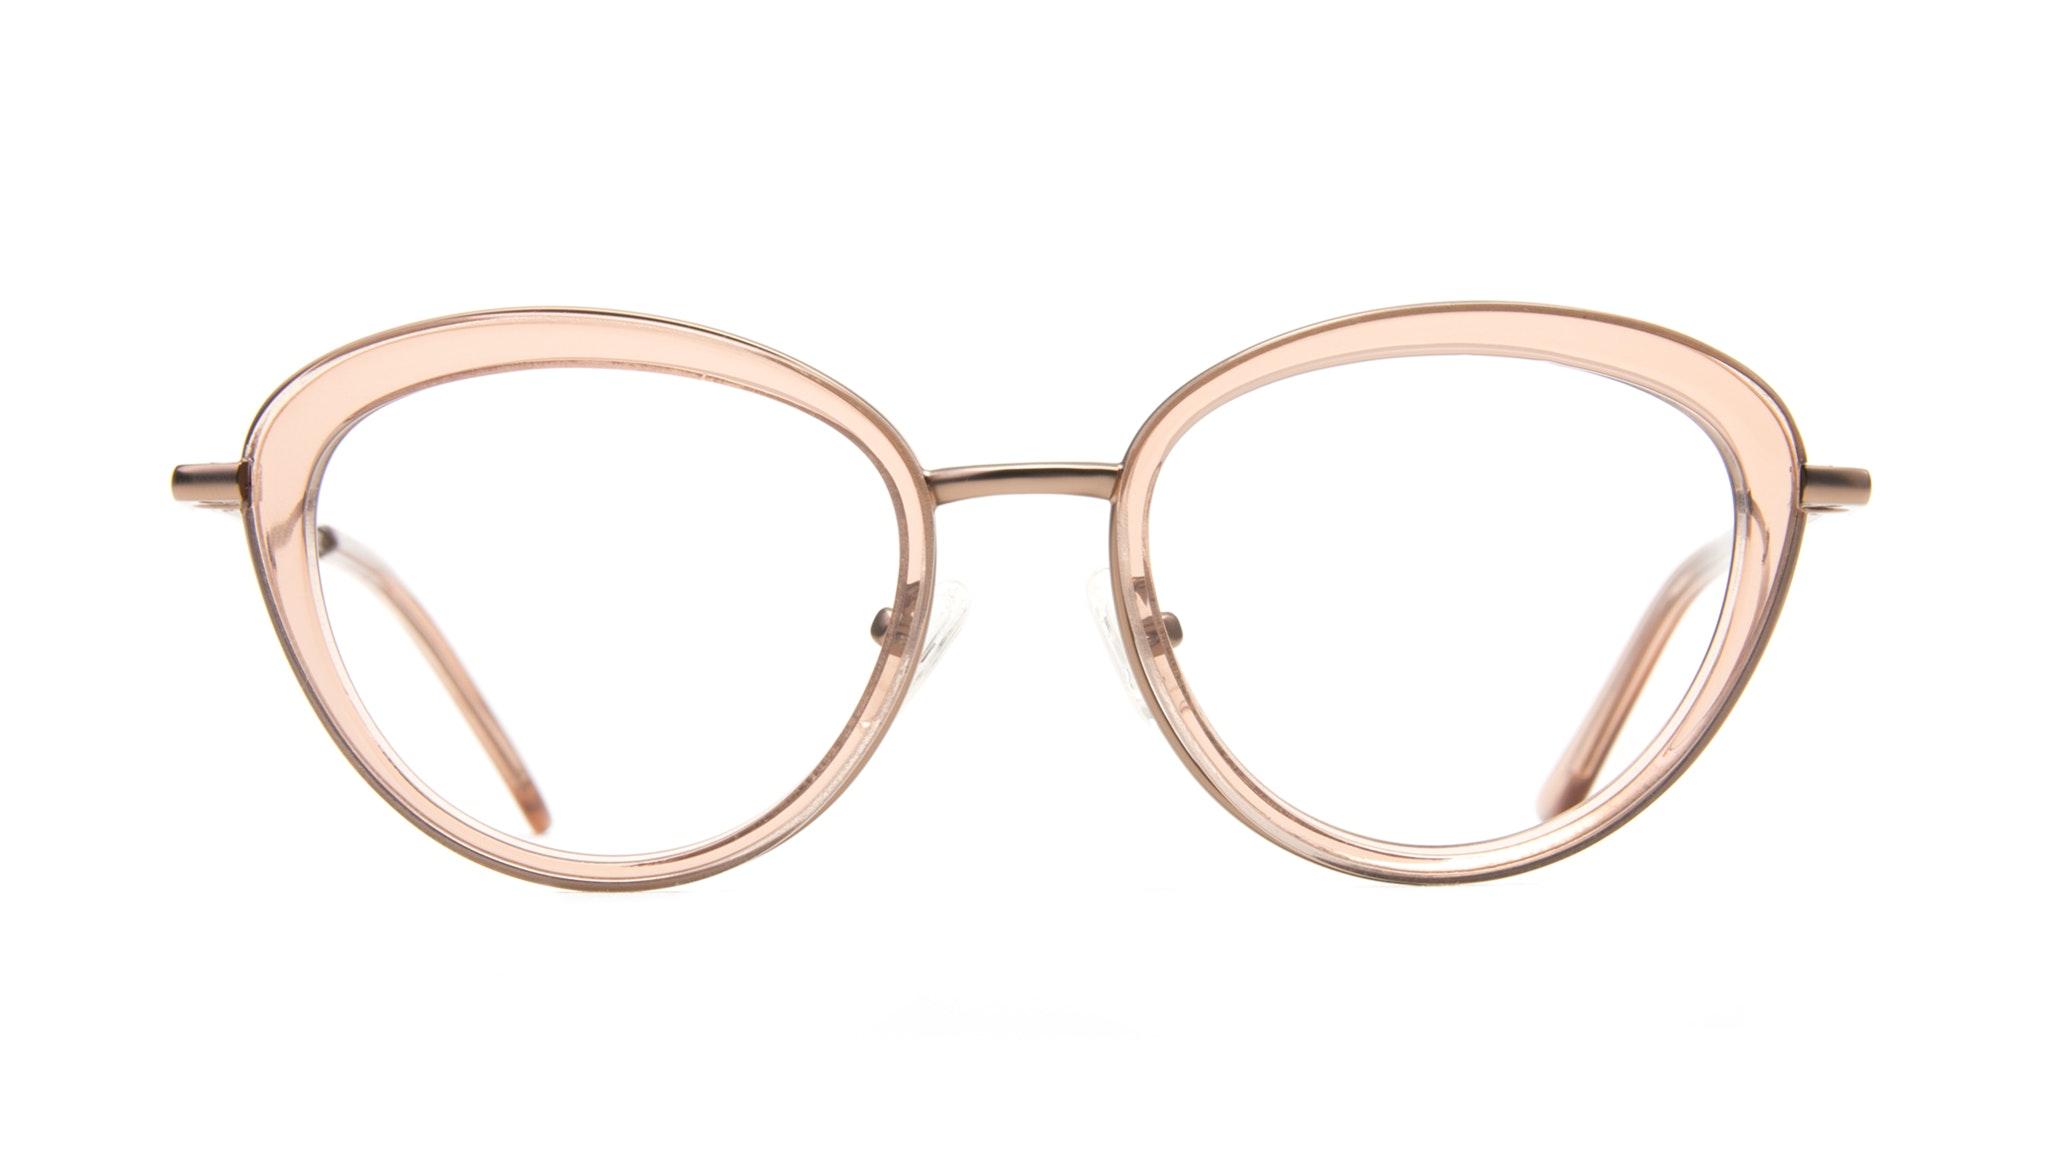 Affordable Fashion Glasses Cat Eye Eyeglasses Women Glory Rose Front